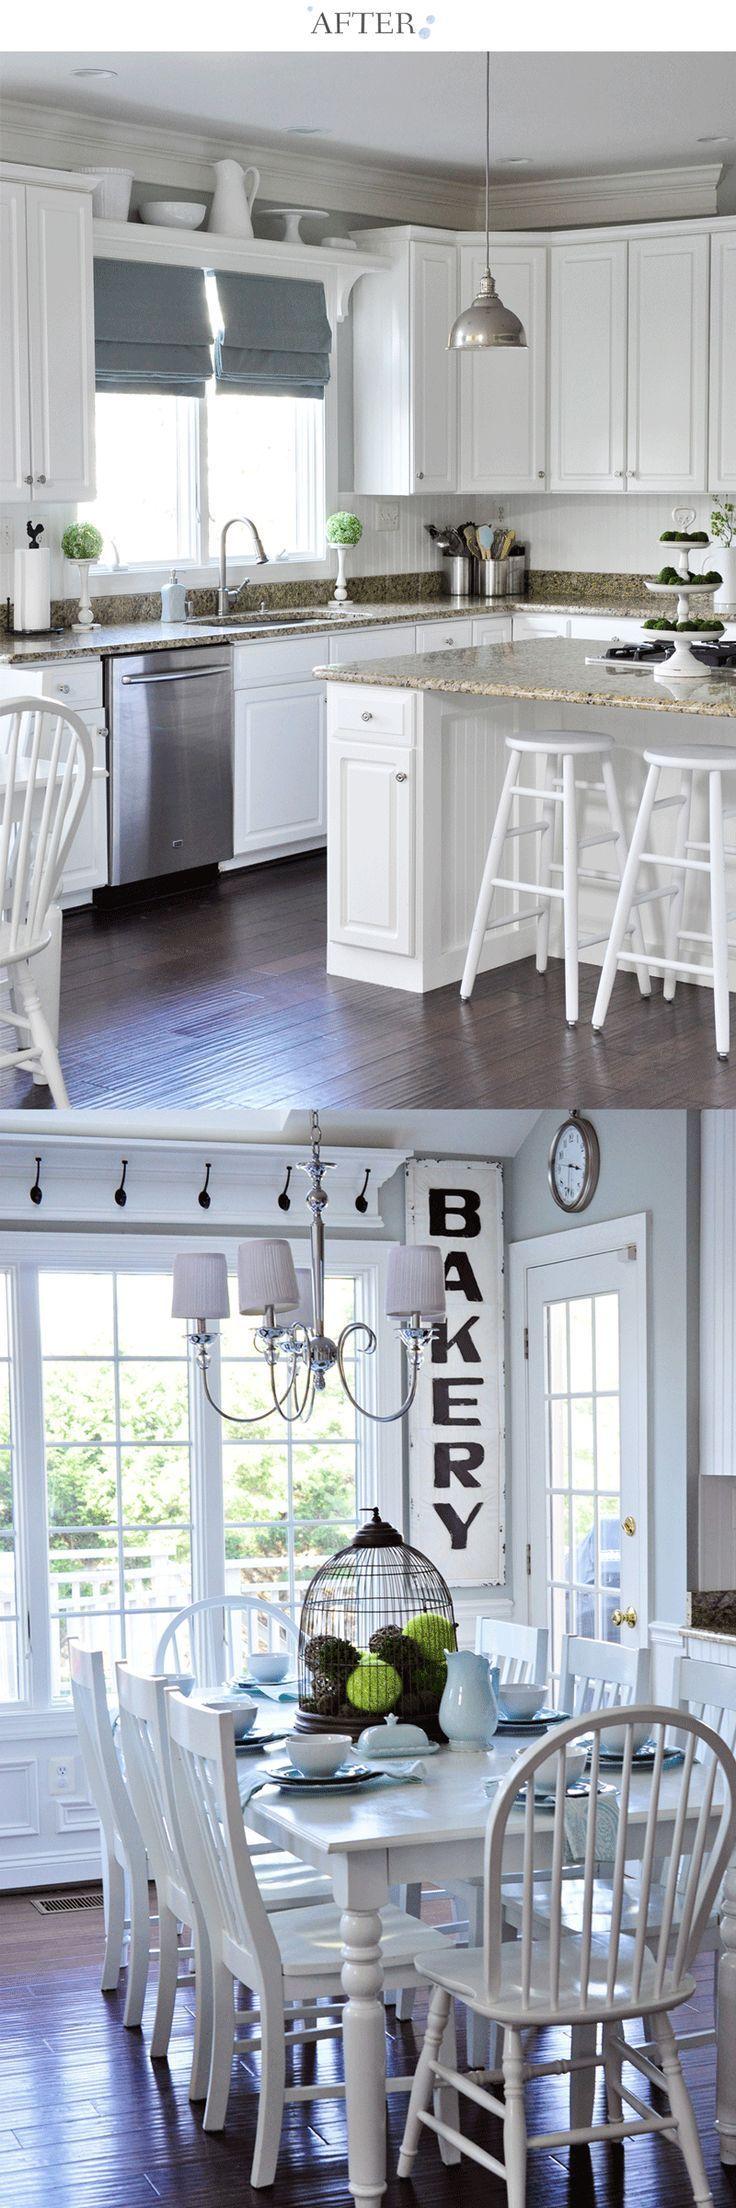 Best 25 Shelf Over Window Ideas On Pinterest Kitchen Window Designs Rustic Crown Molding And